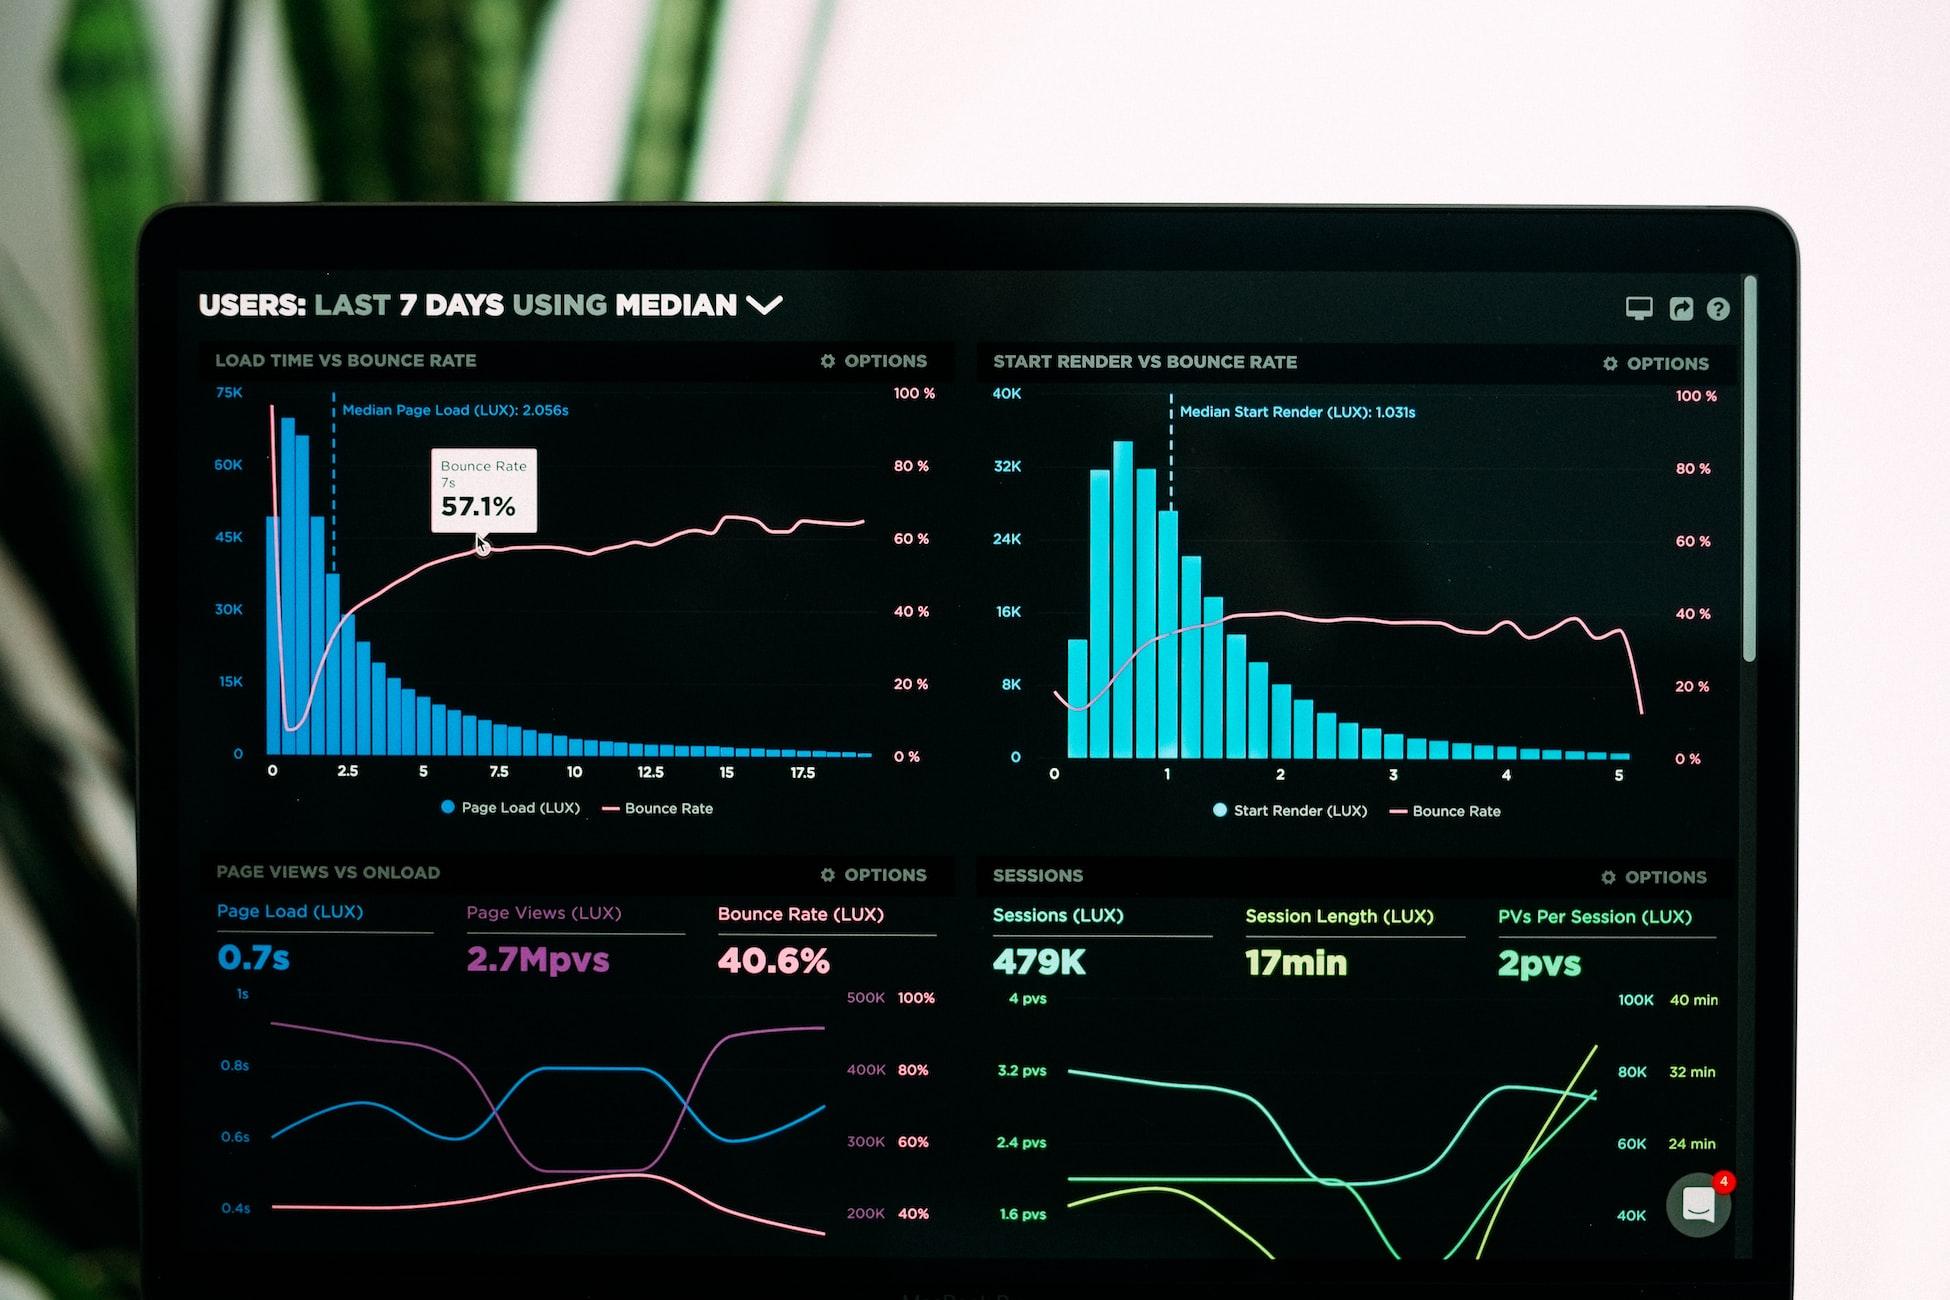 Big Data as part of Predictive Analytics